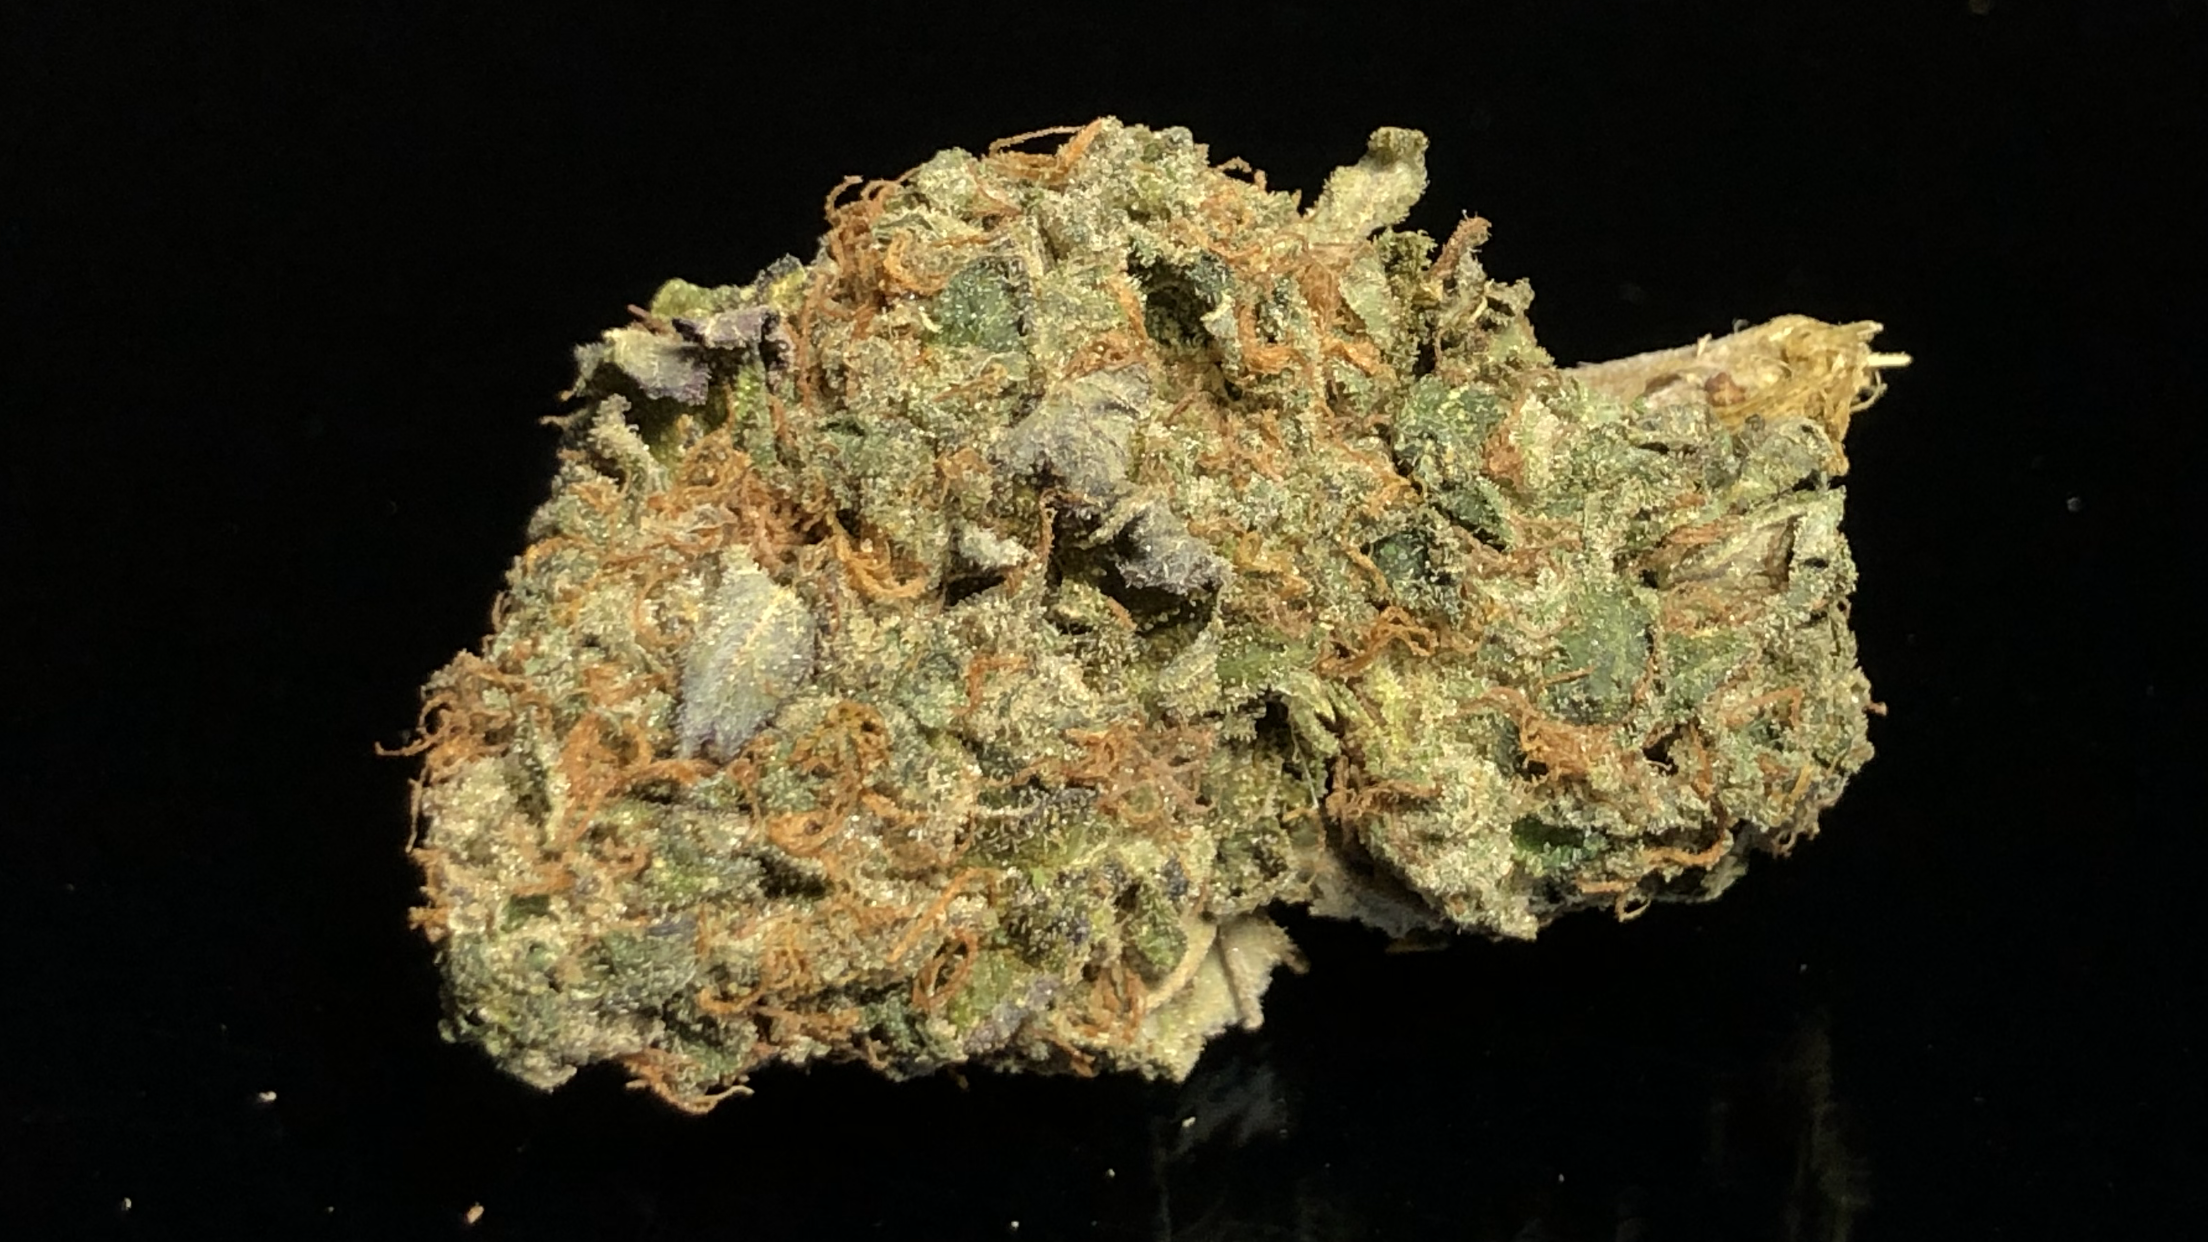 DEATH STAR - Upto 27% THC - Tuesday Sale $20 off 1 oz, $10 off 1/2 oz